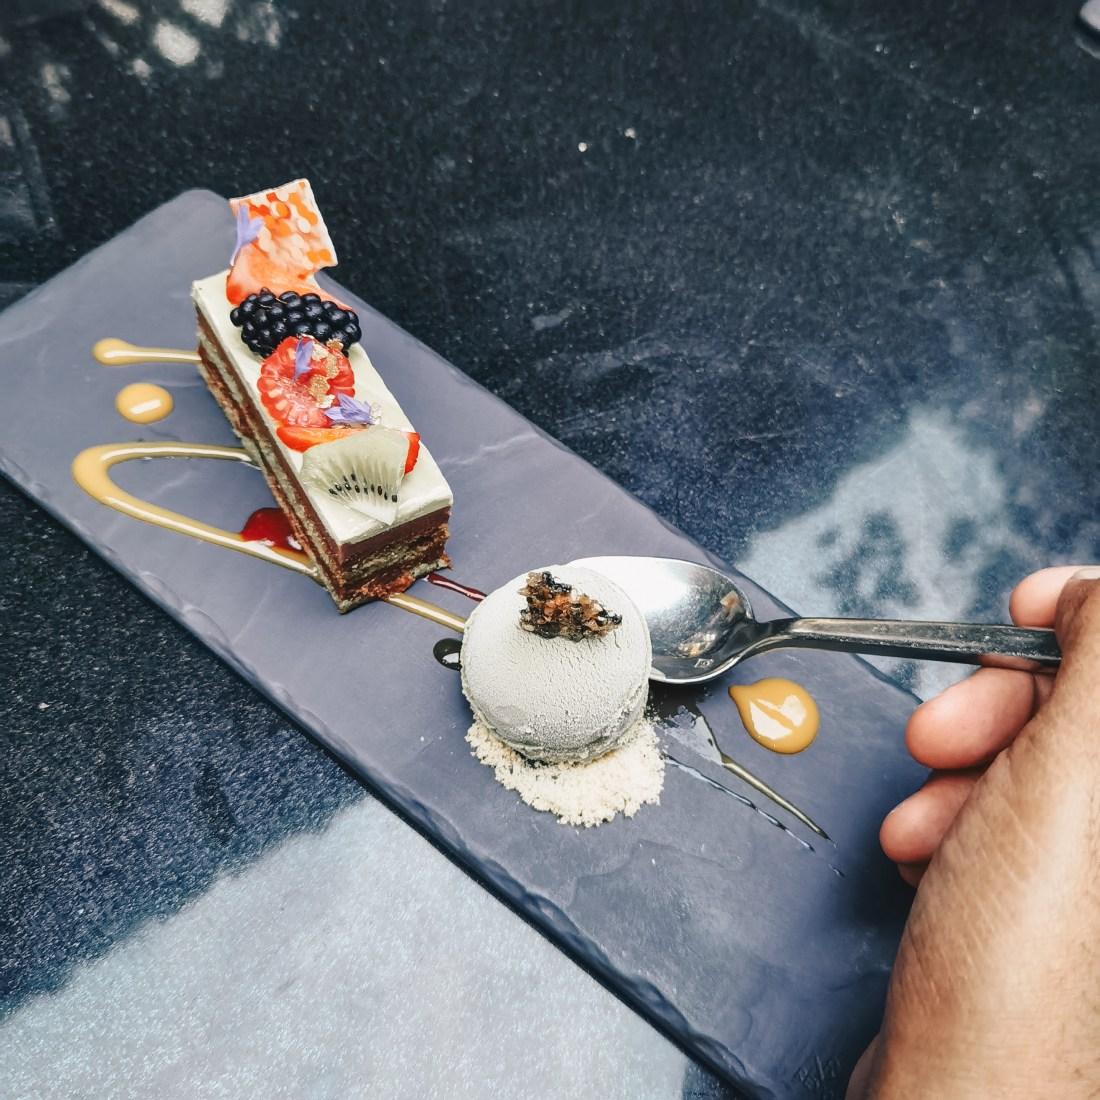 Minami Yaletown Vancouver - Shokai Menu - Chef's Tasting Menu - Matcha Opera Cake